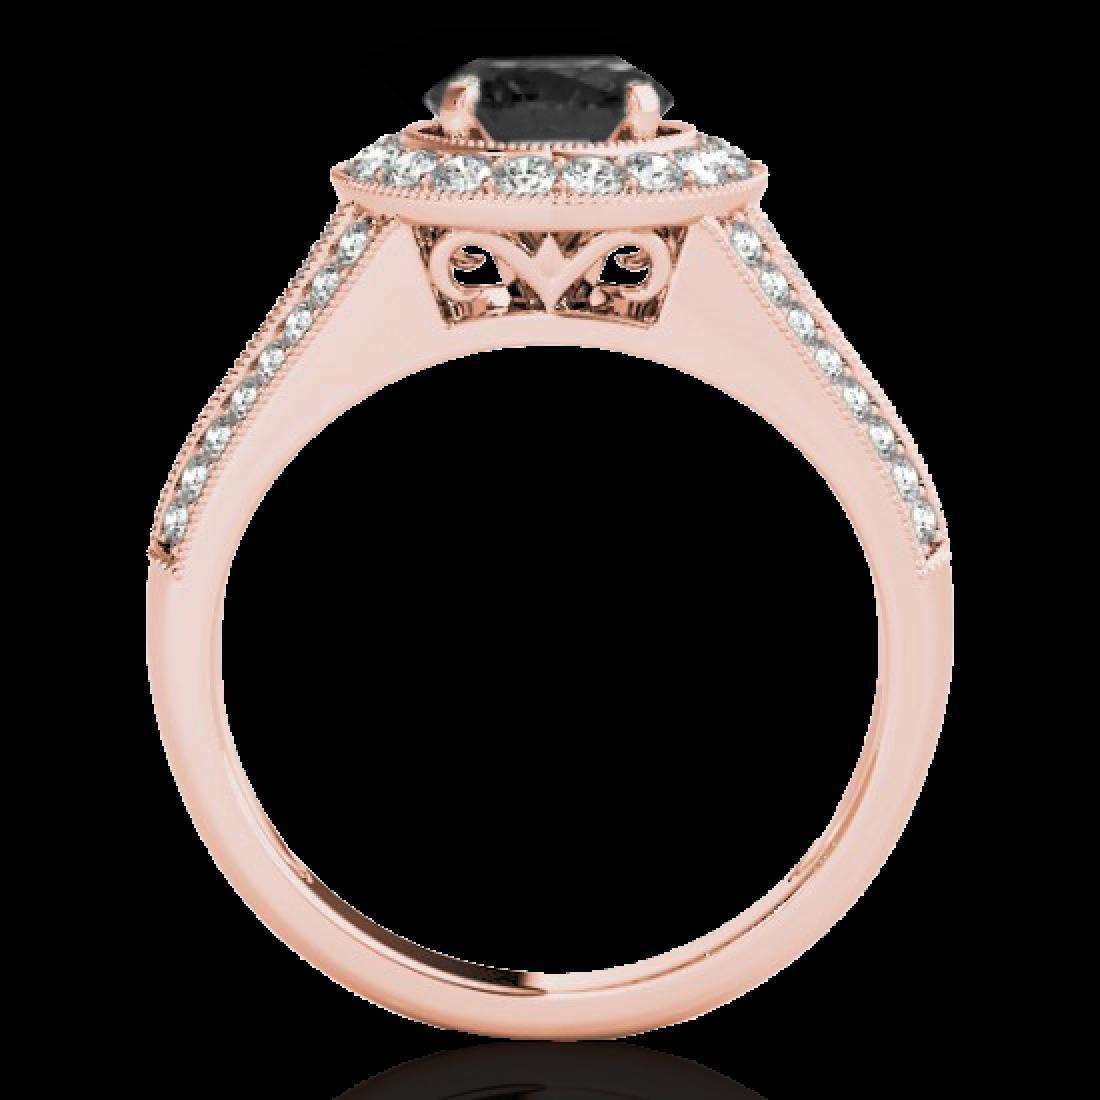 1.7 CTW Certified VS Black Diamond Solitaire Halo Ring - 2